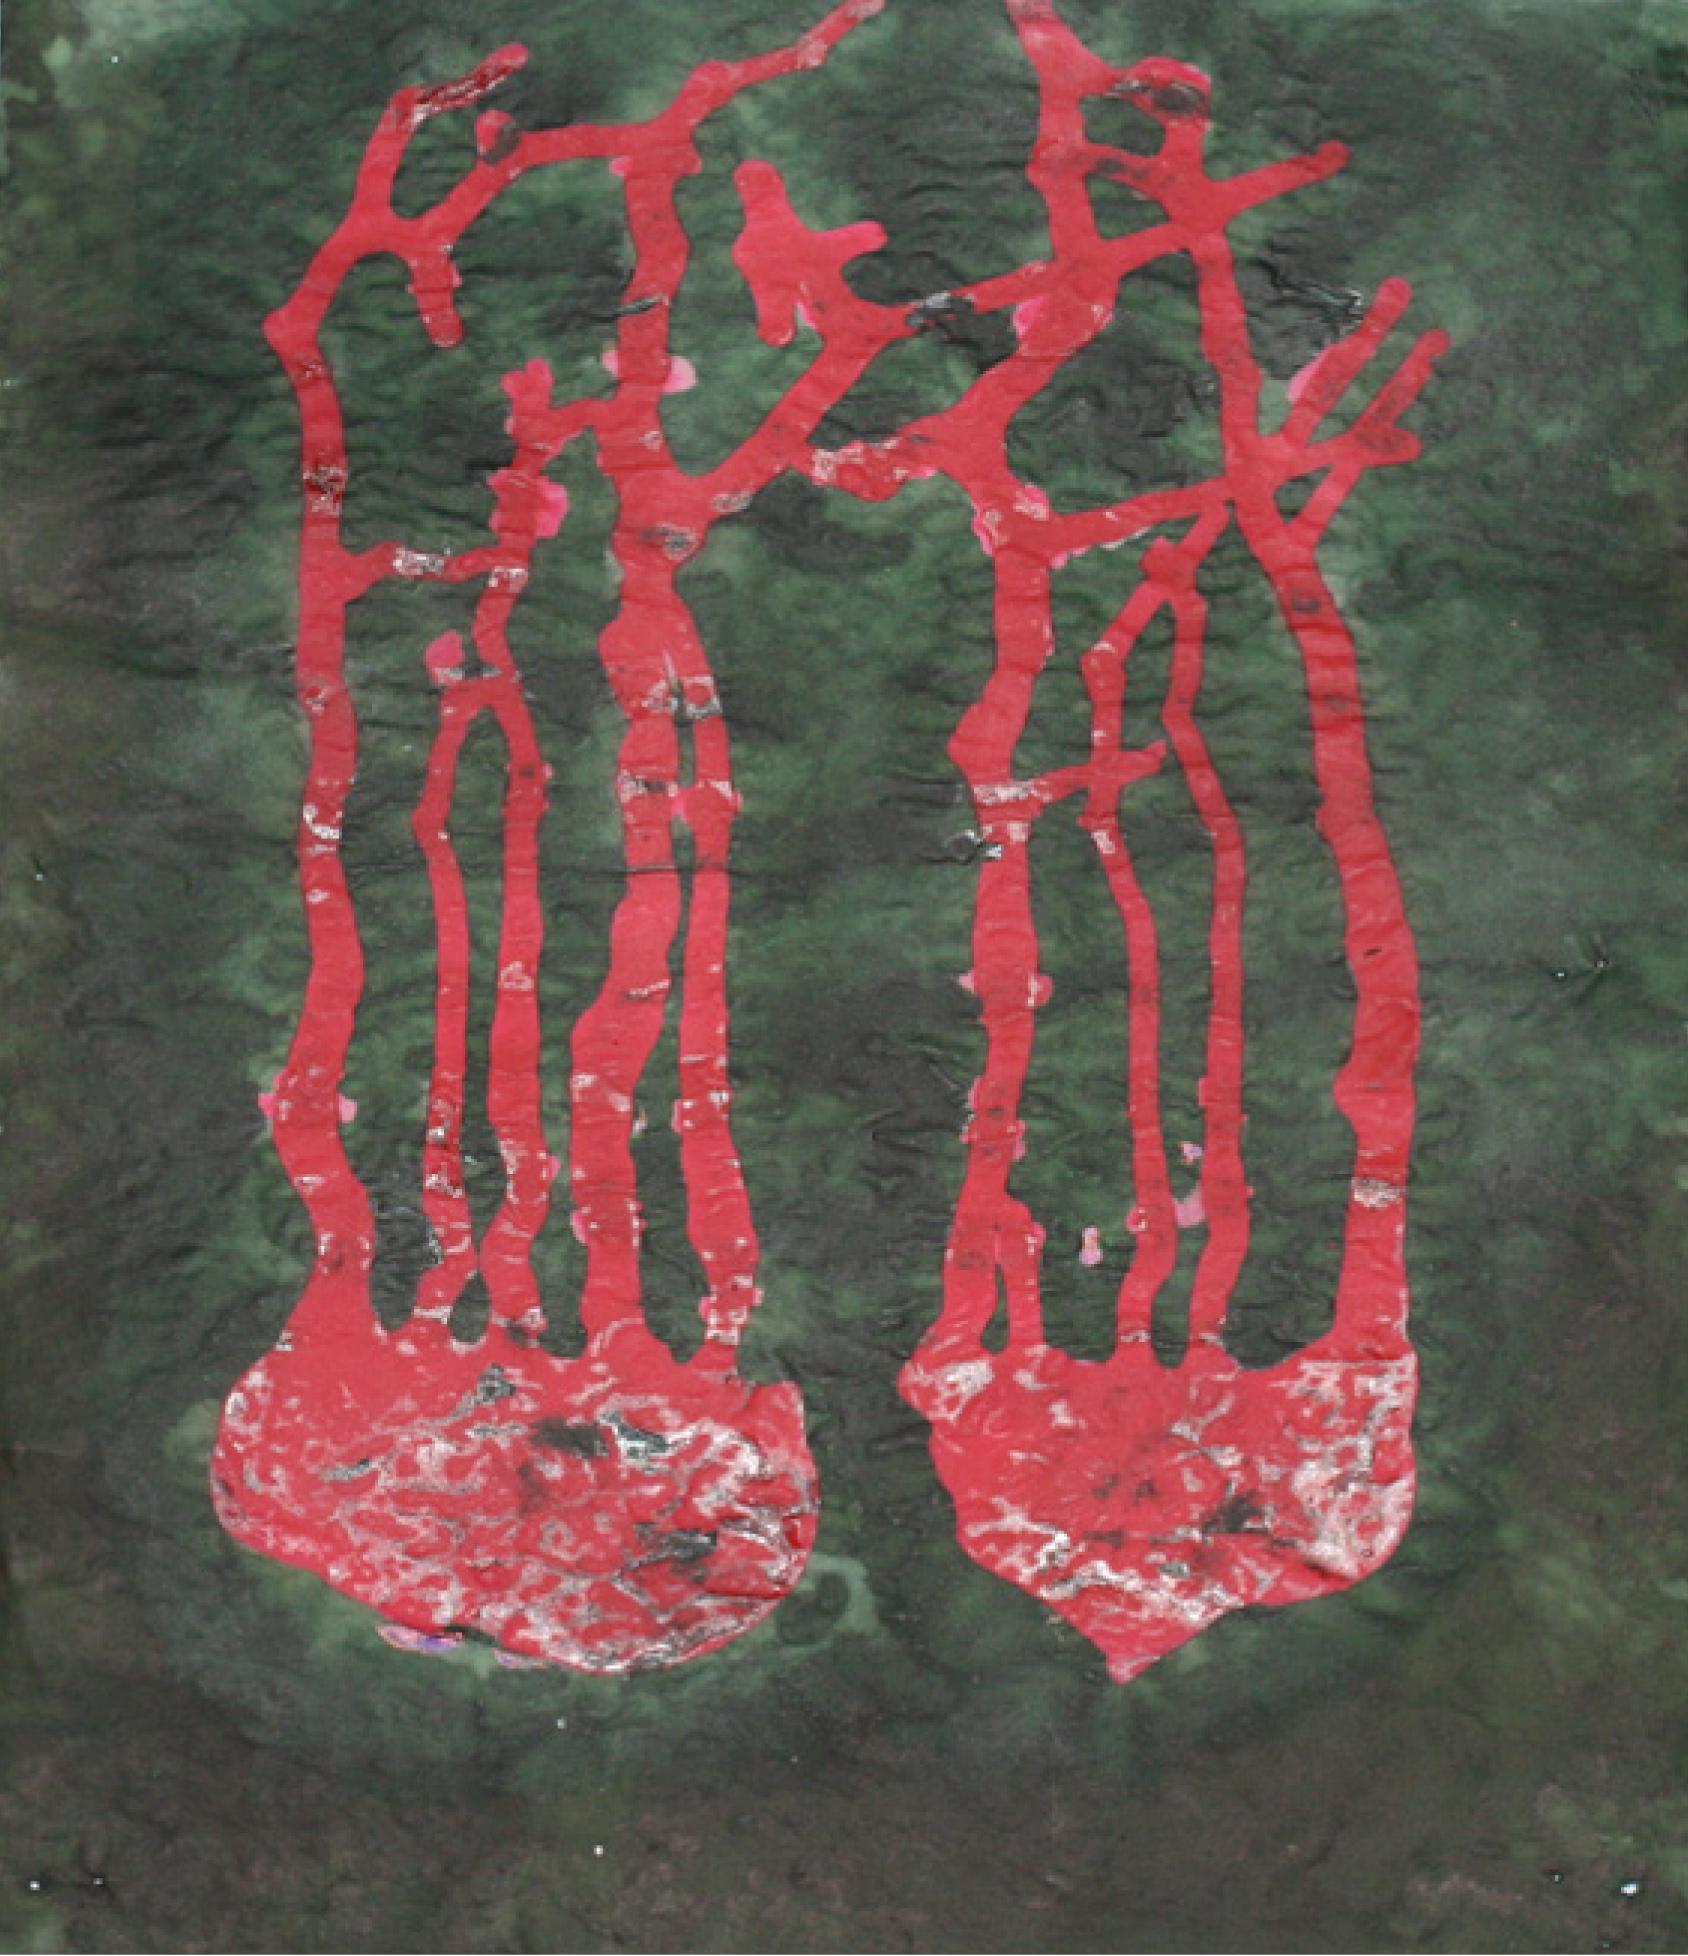 30  | Thea Richter | Keimen 1643 | Acryl/Tusche auf Transparentpapier | 30 x 25 cm | Kunstlotterie